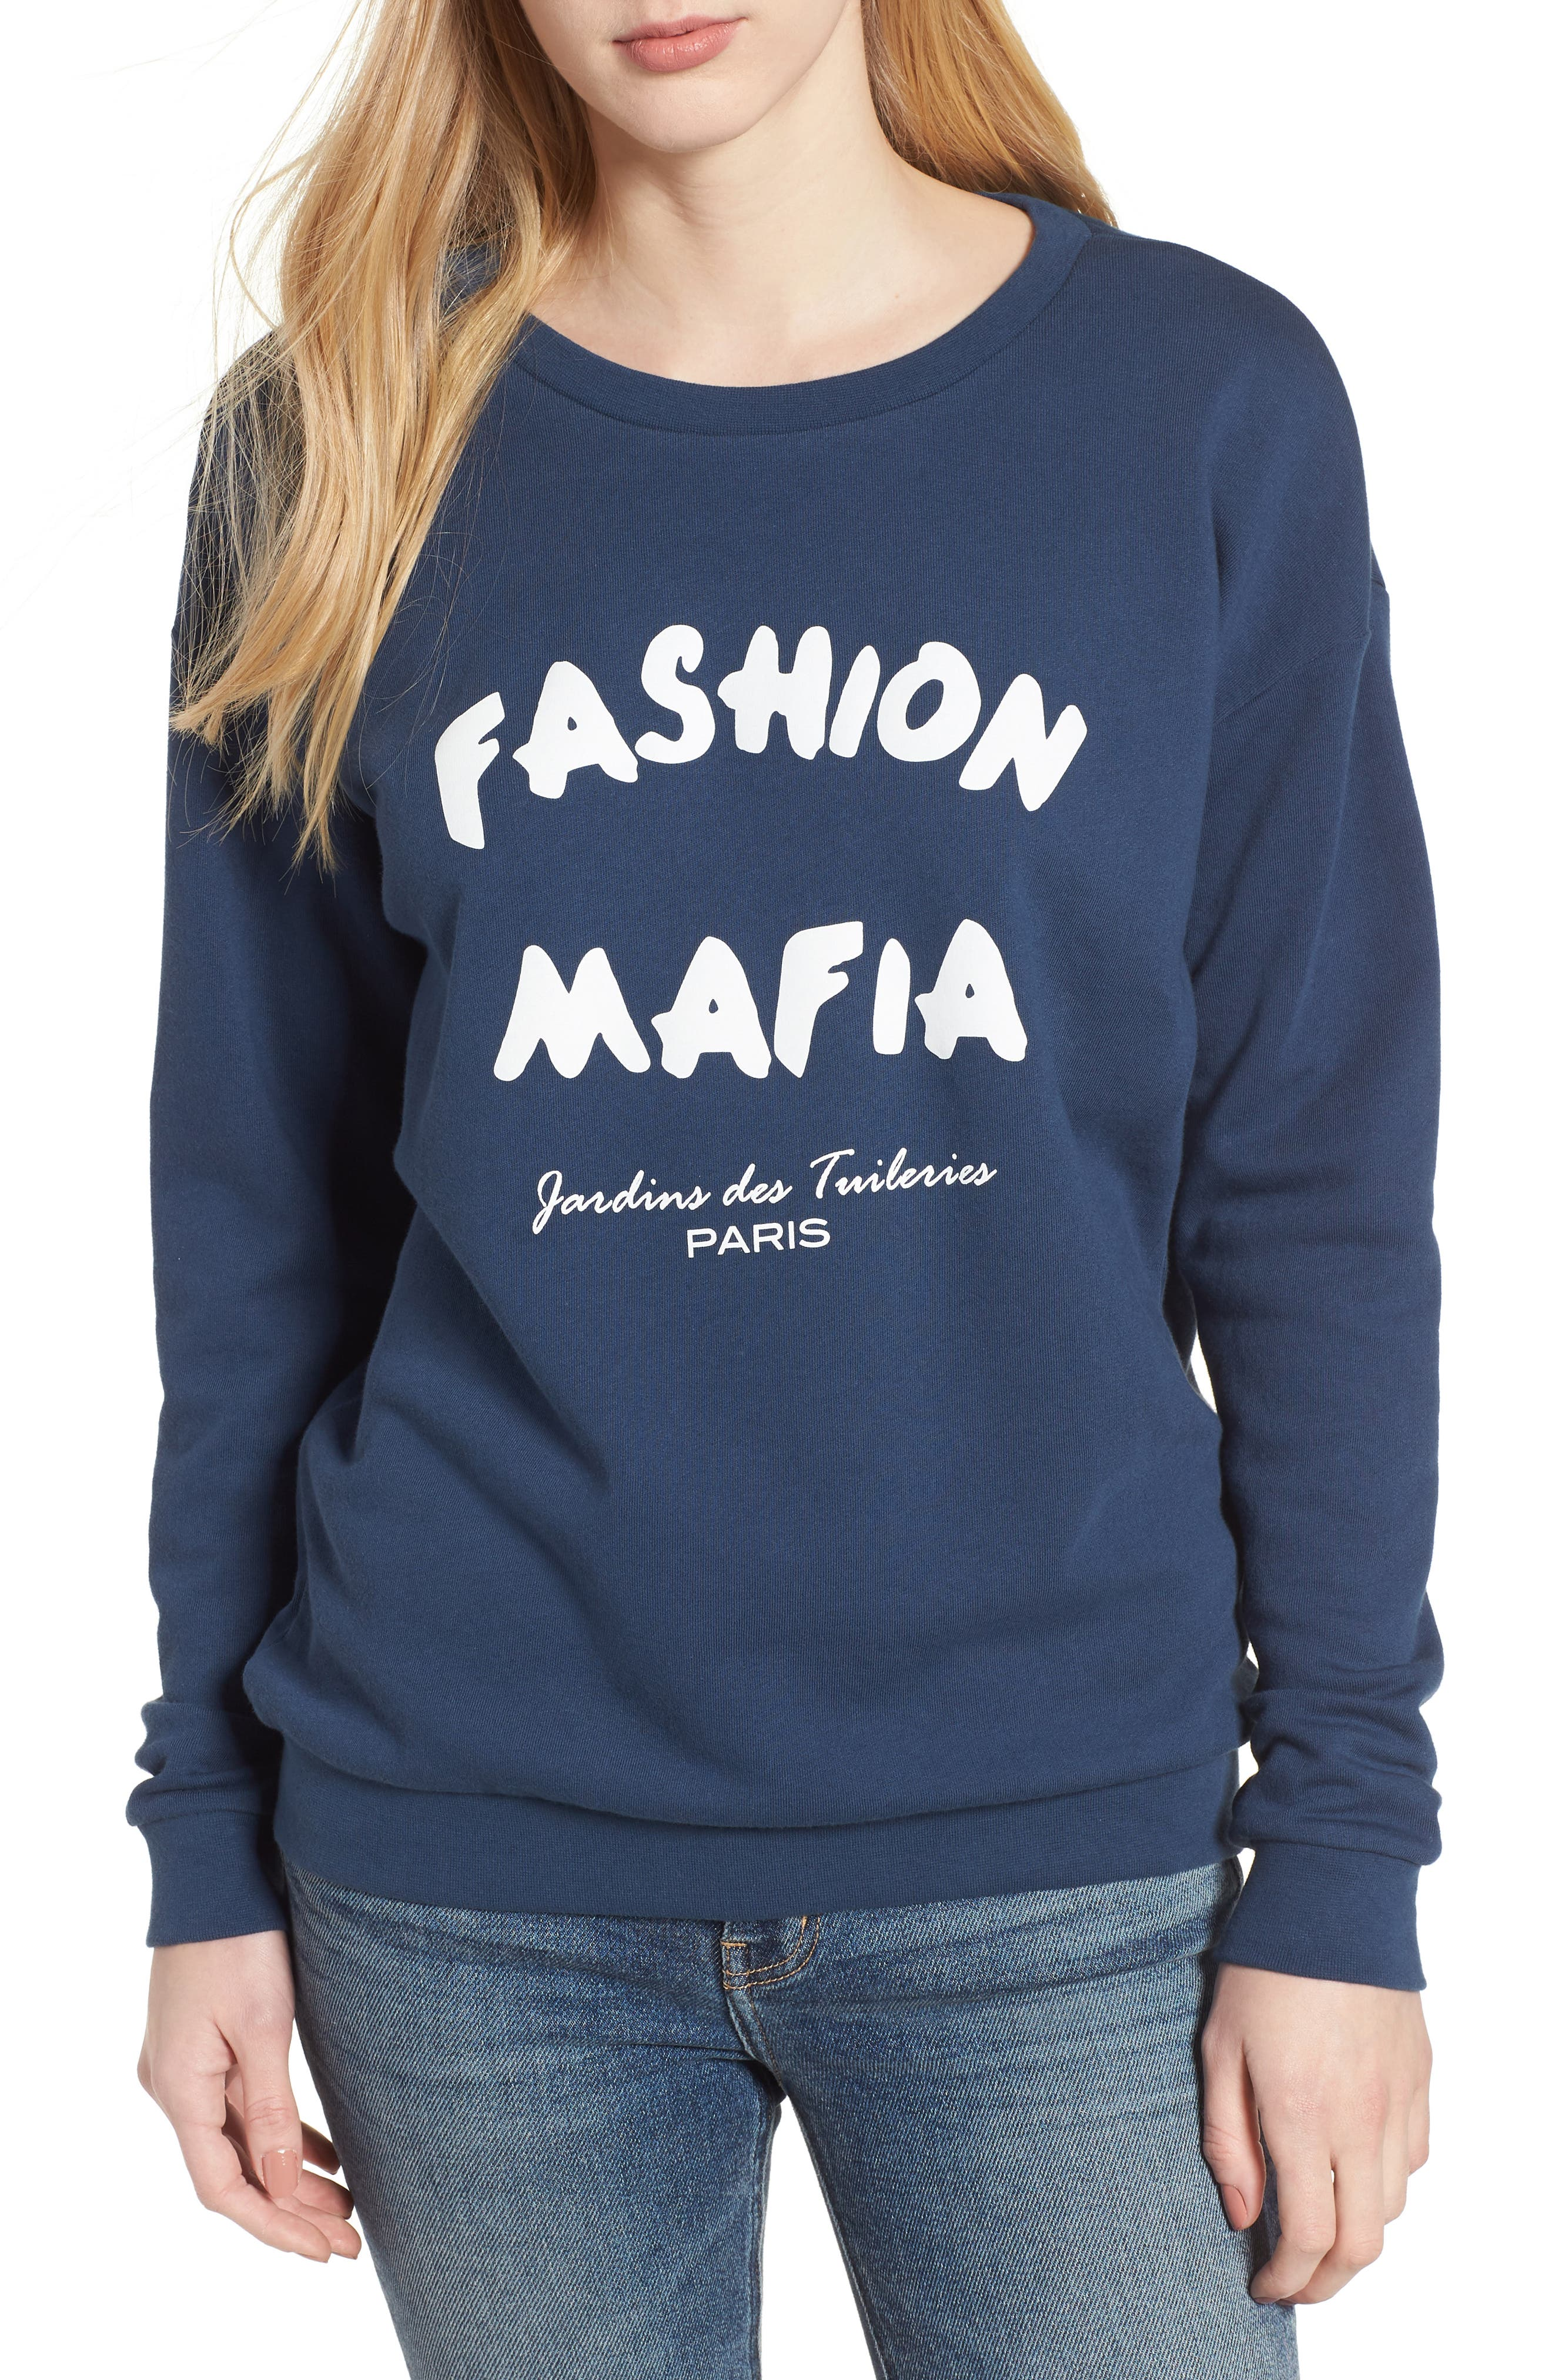 Alexa - Fashion Mafia Sweatshirt,                         Main,                         color,